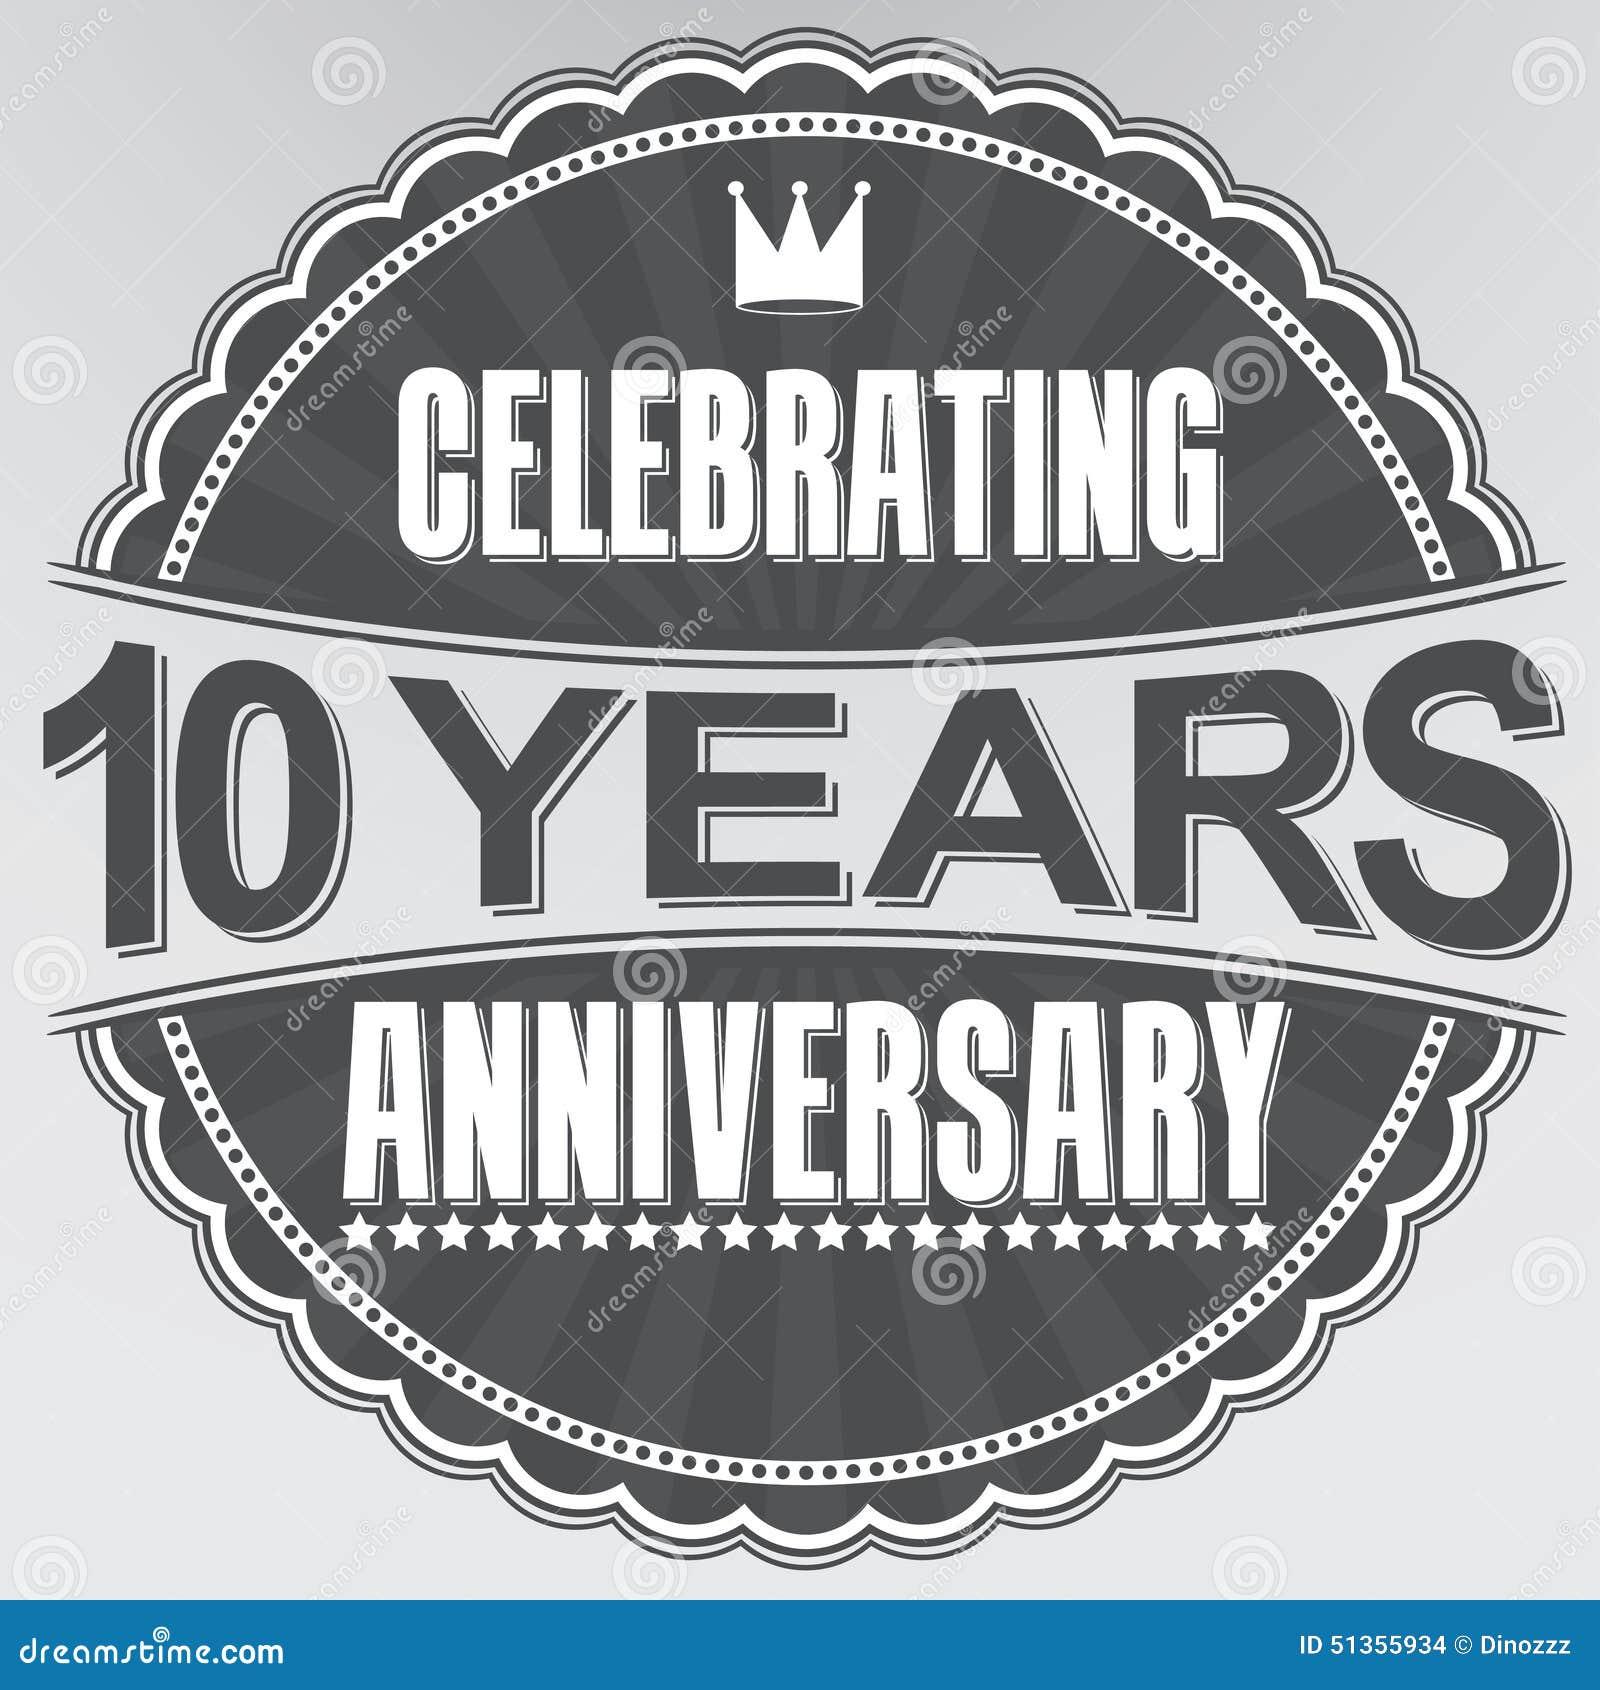 Celebrating 10 Years Anniversary Retro Label Vector Illustration